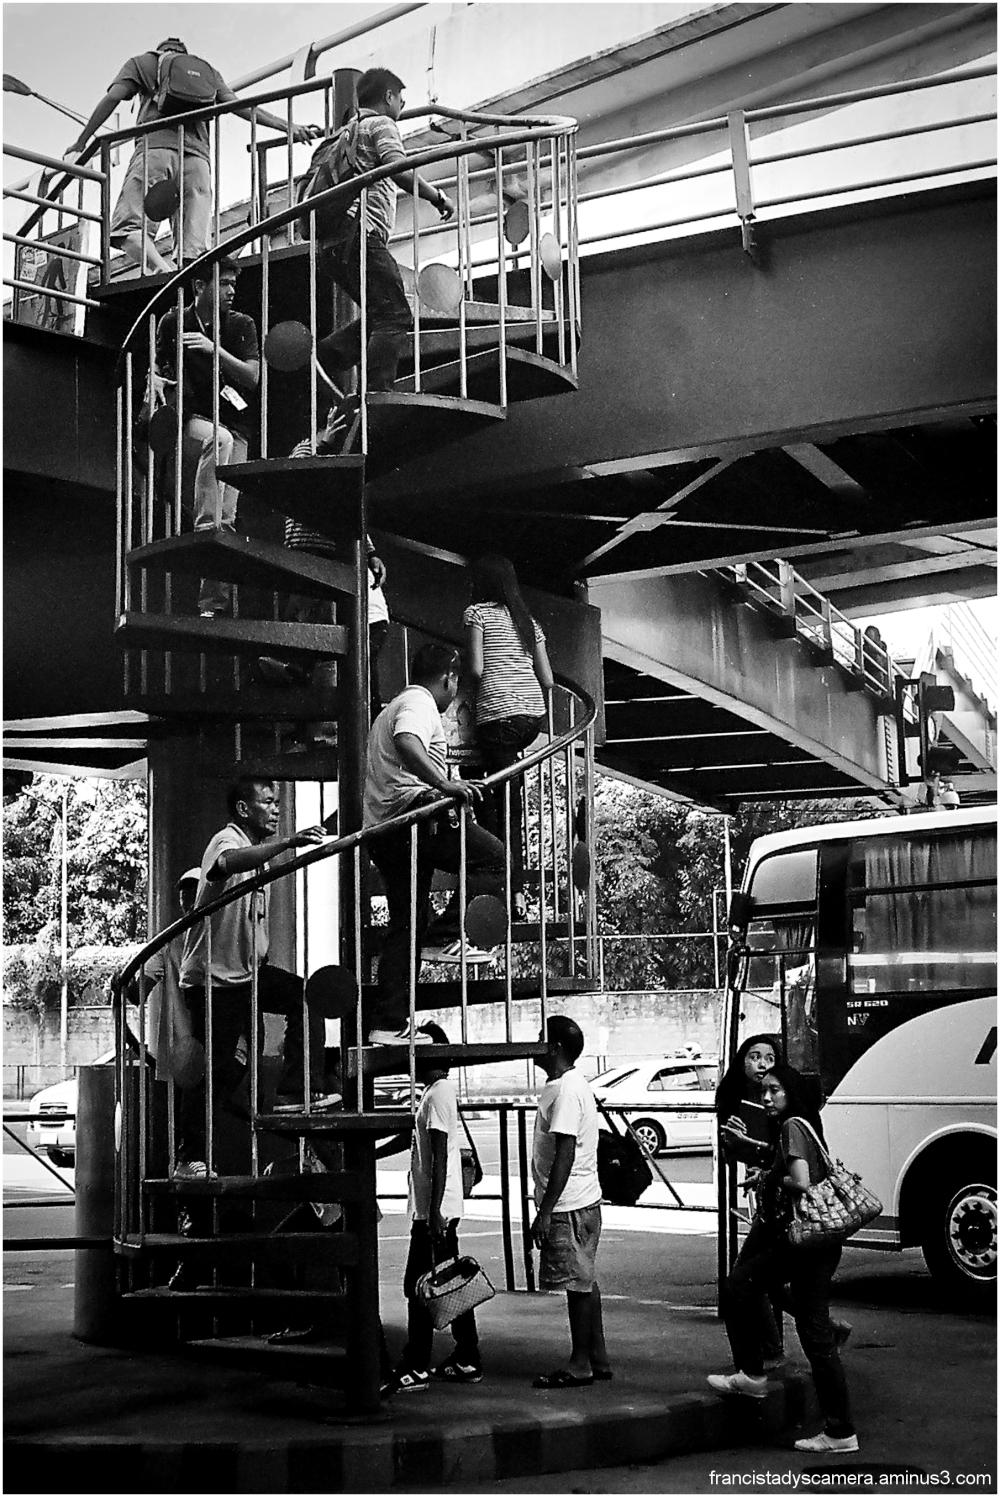 francis tady, streets of manila, philippines, bw